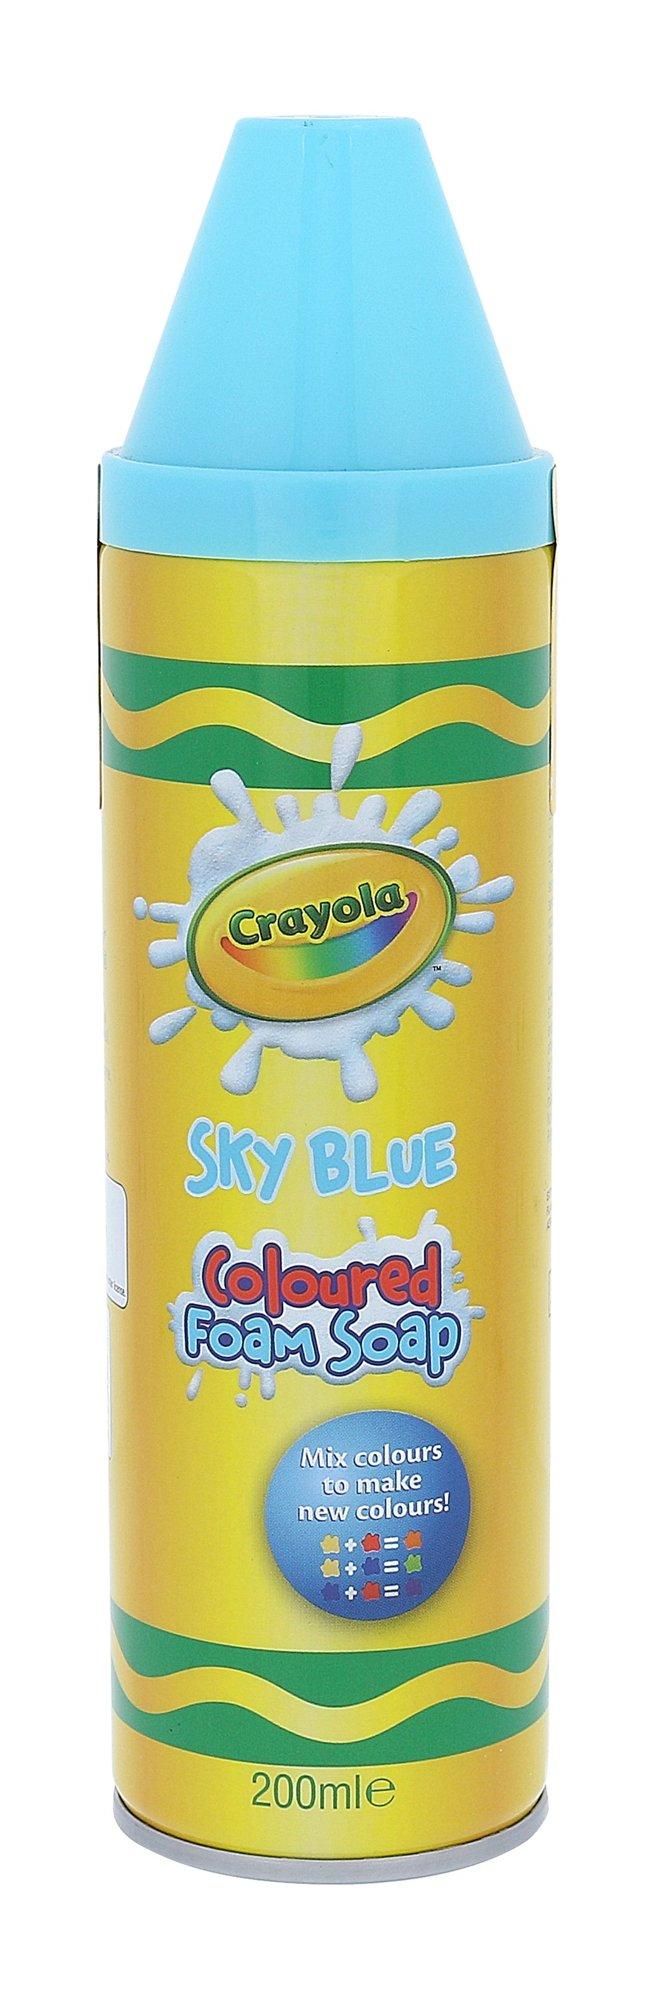 Crayola Coloured Foam Soap Cosmetic 200ml Sky Blue